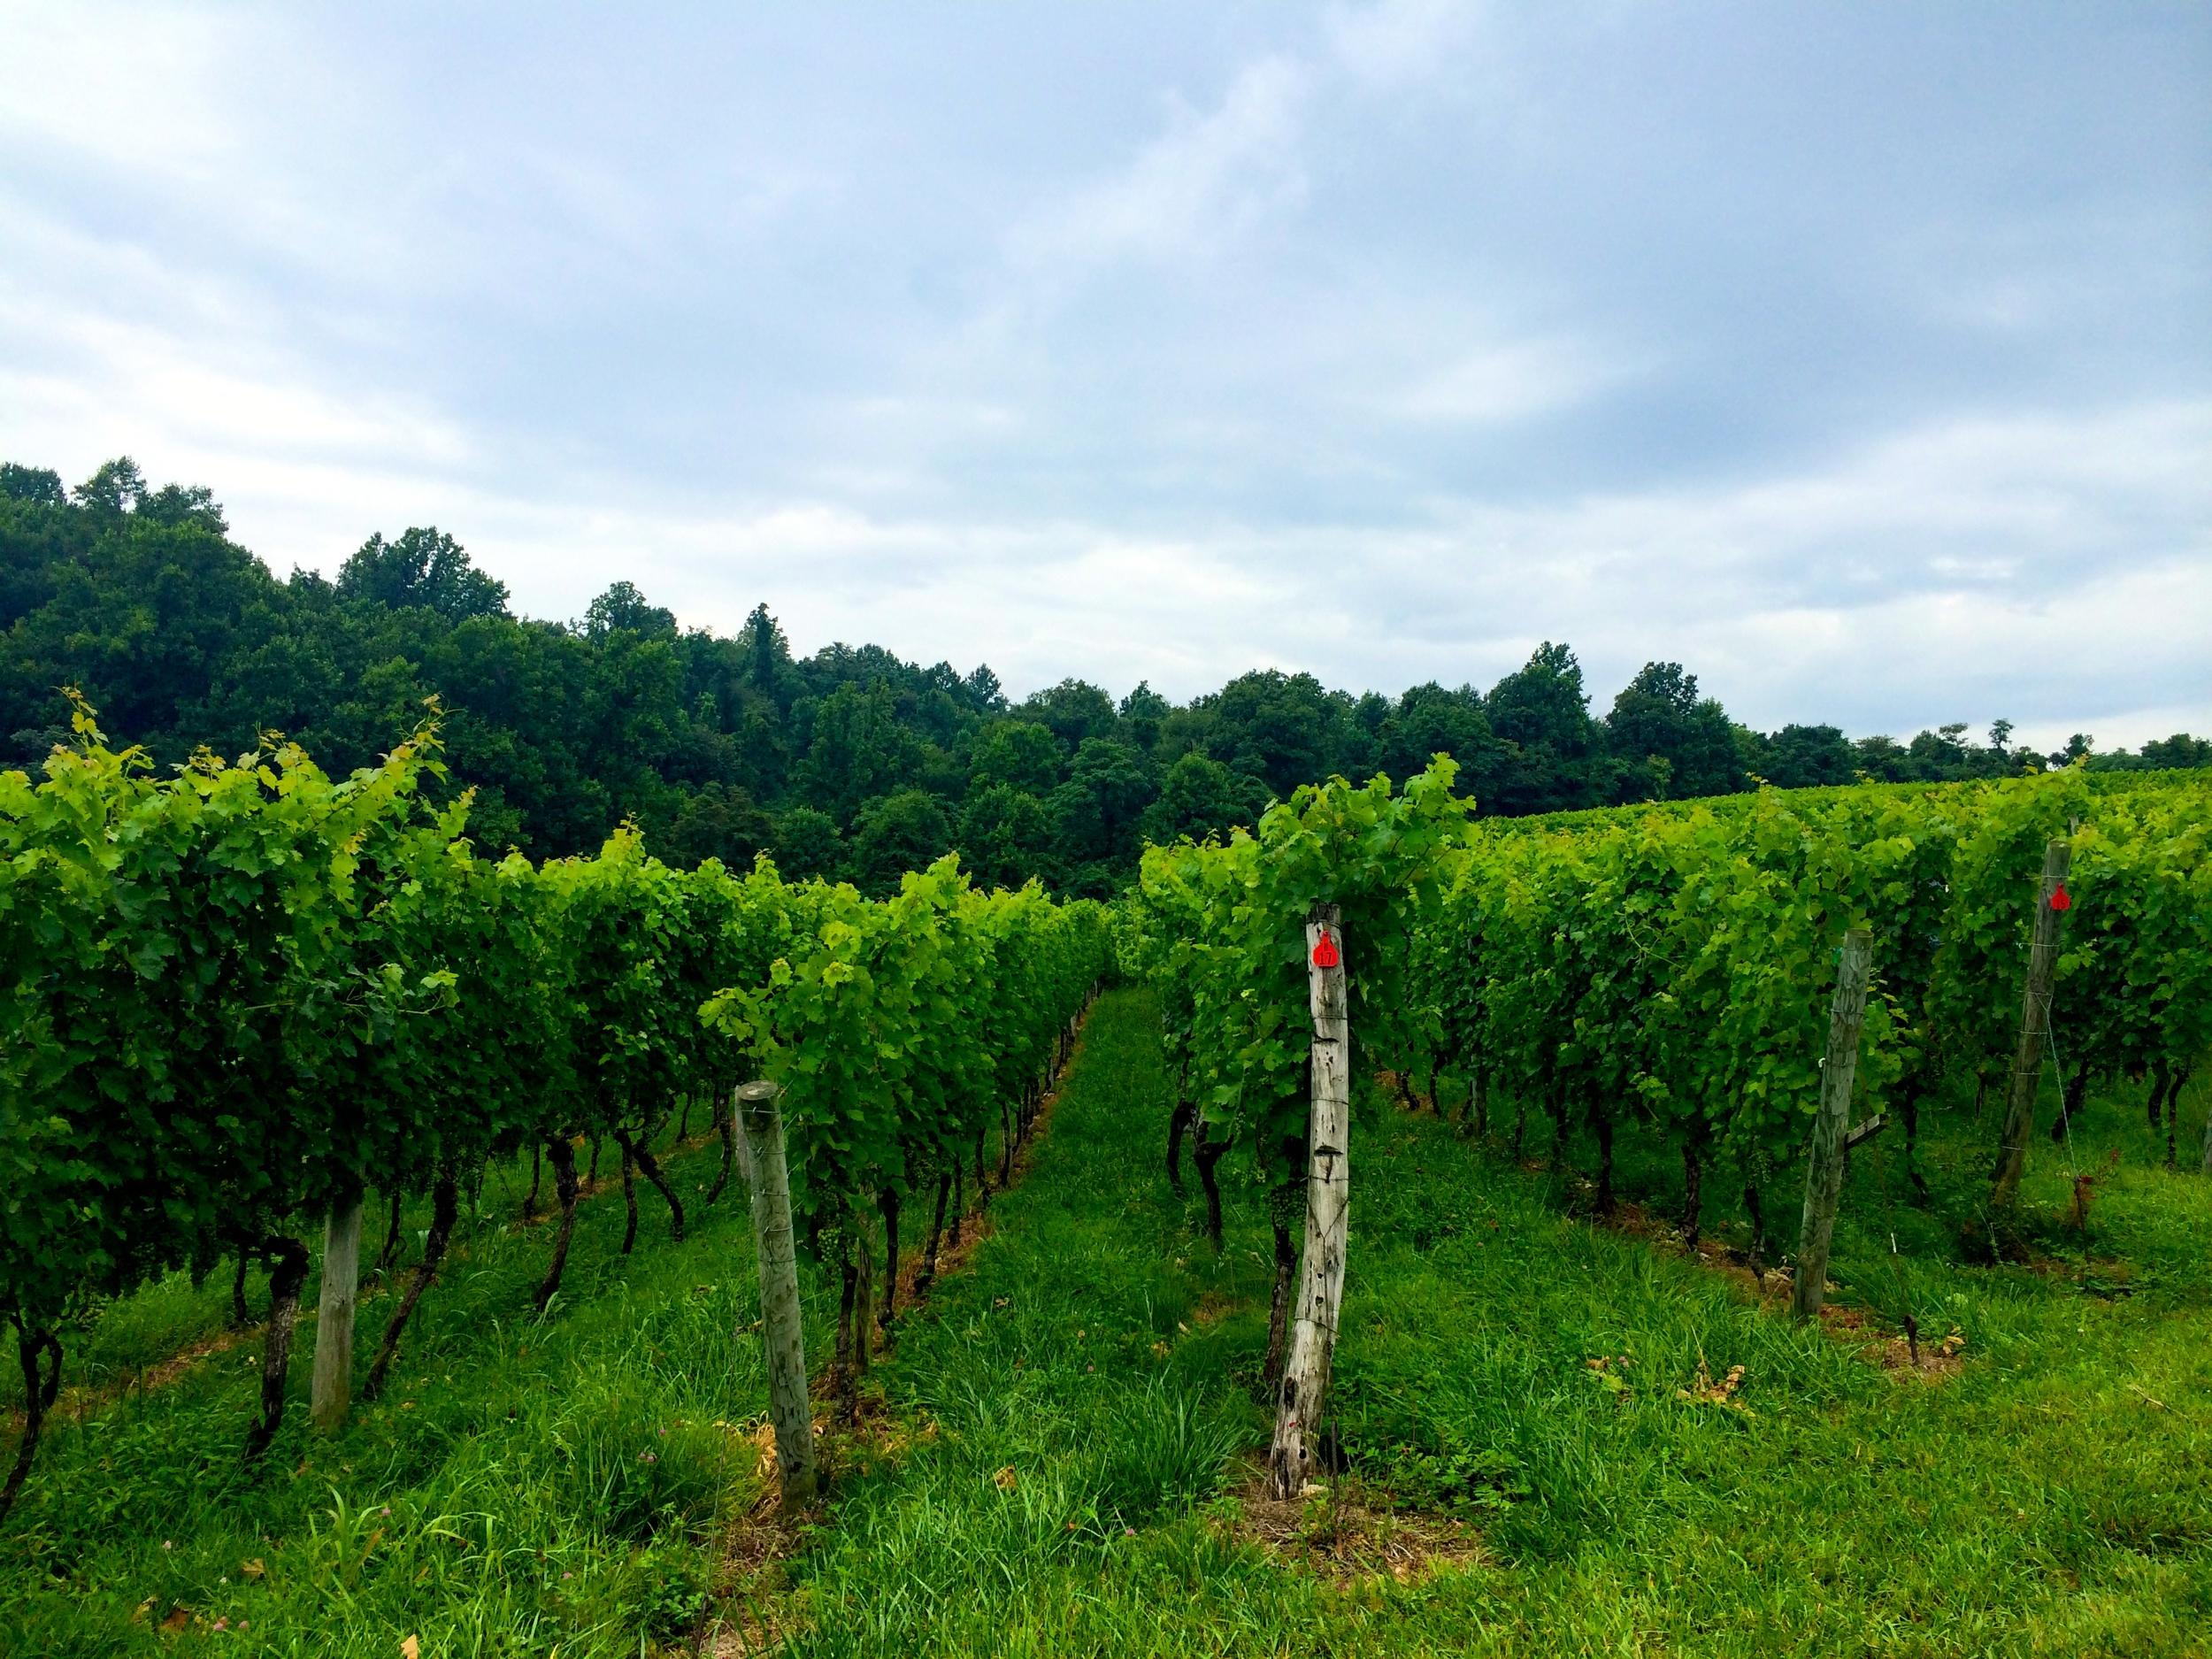 Linden Vineyards